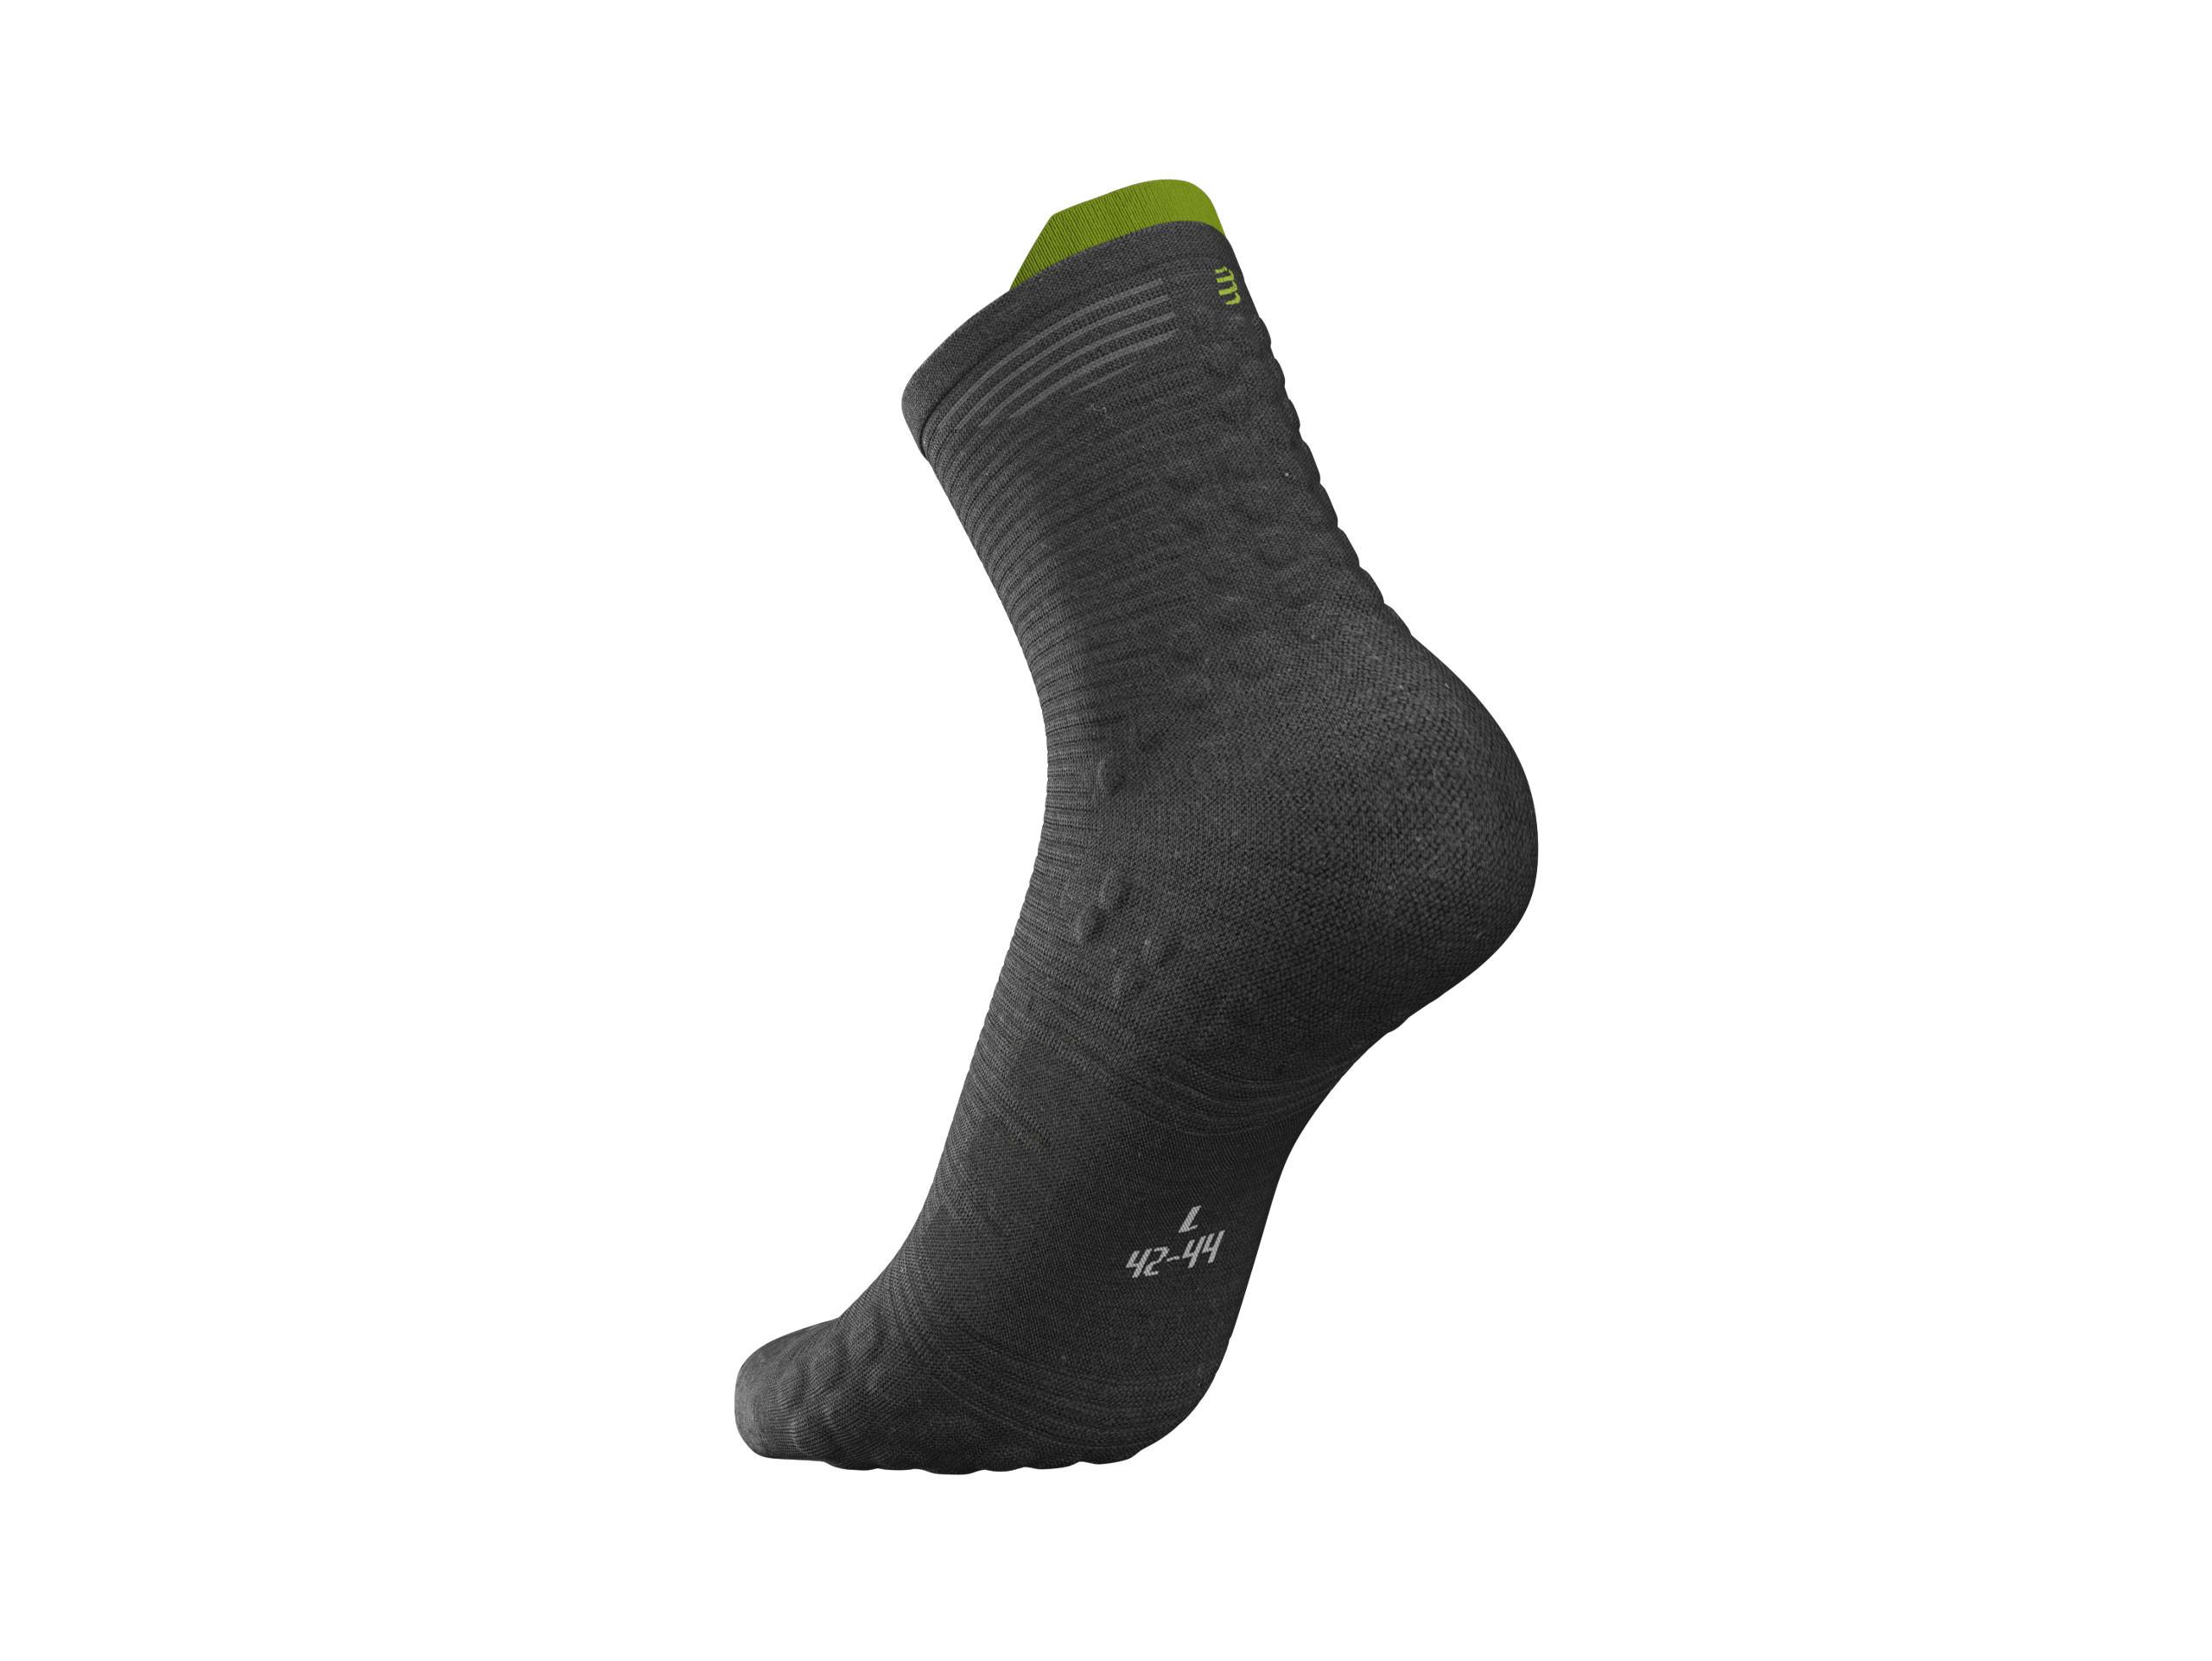 Calcetines deportivos pro v3.0 Run High - Black Edition 2019